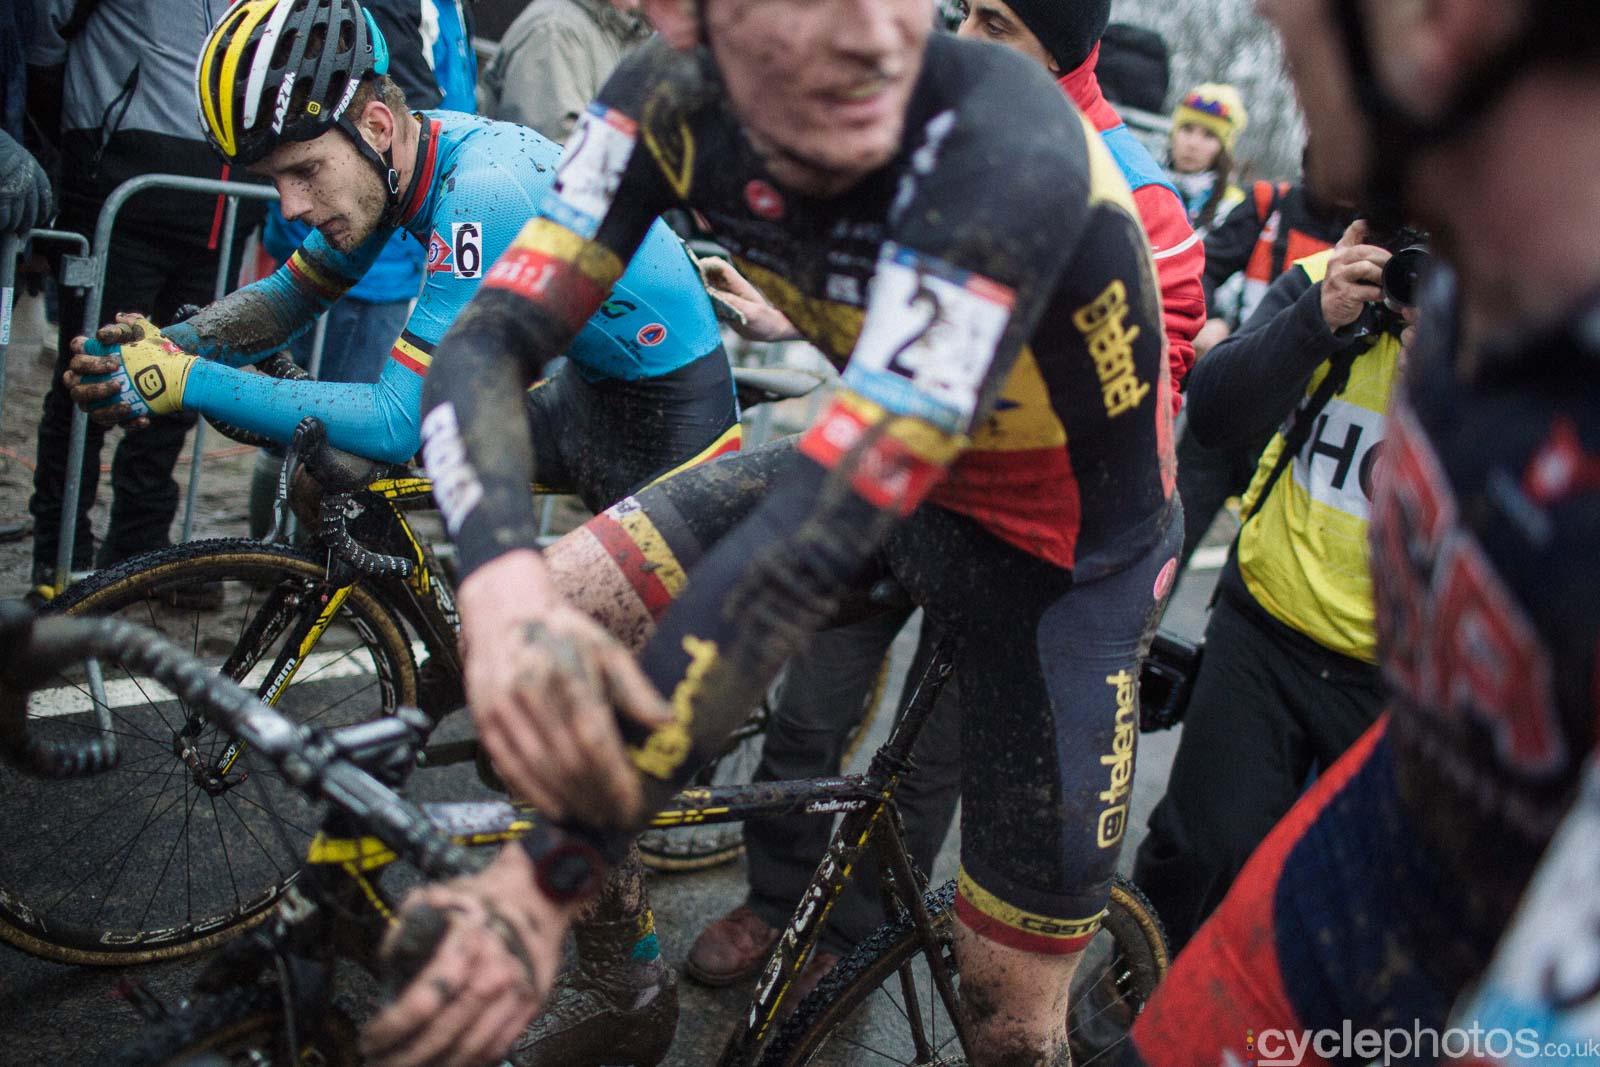 2016-cyclephotos-cyclocross-hoogerheide-121338-daan-soote